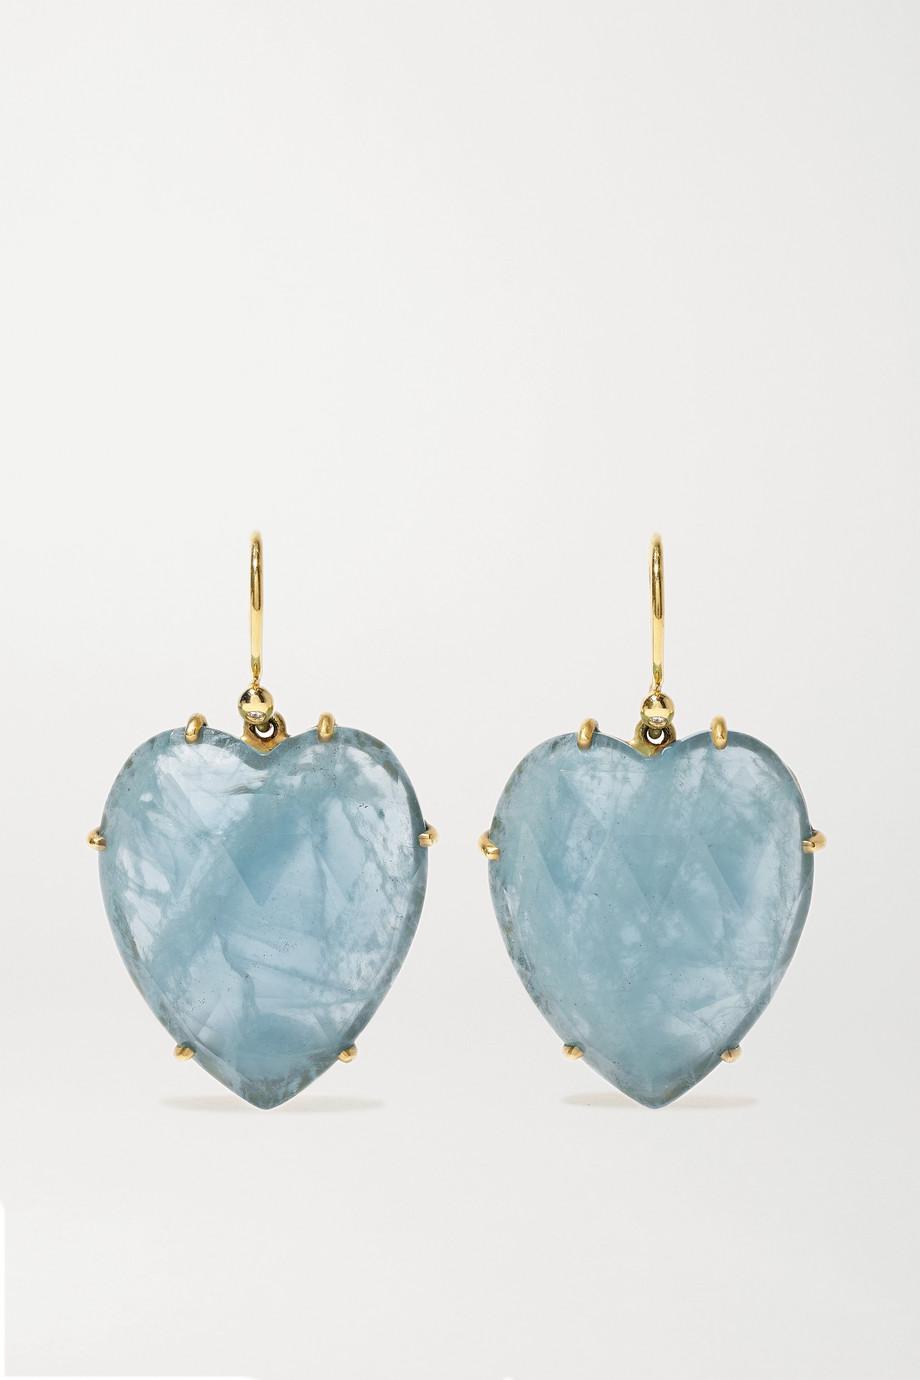 Irene Neuwirth Love 18-karat gold aquamarine earrings